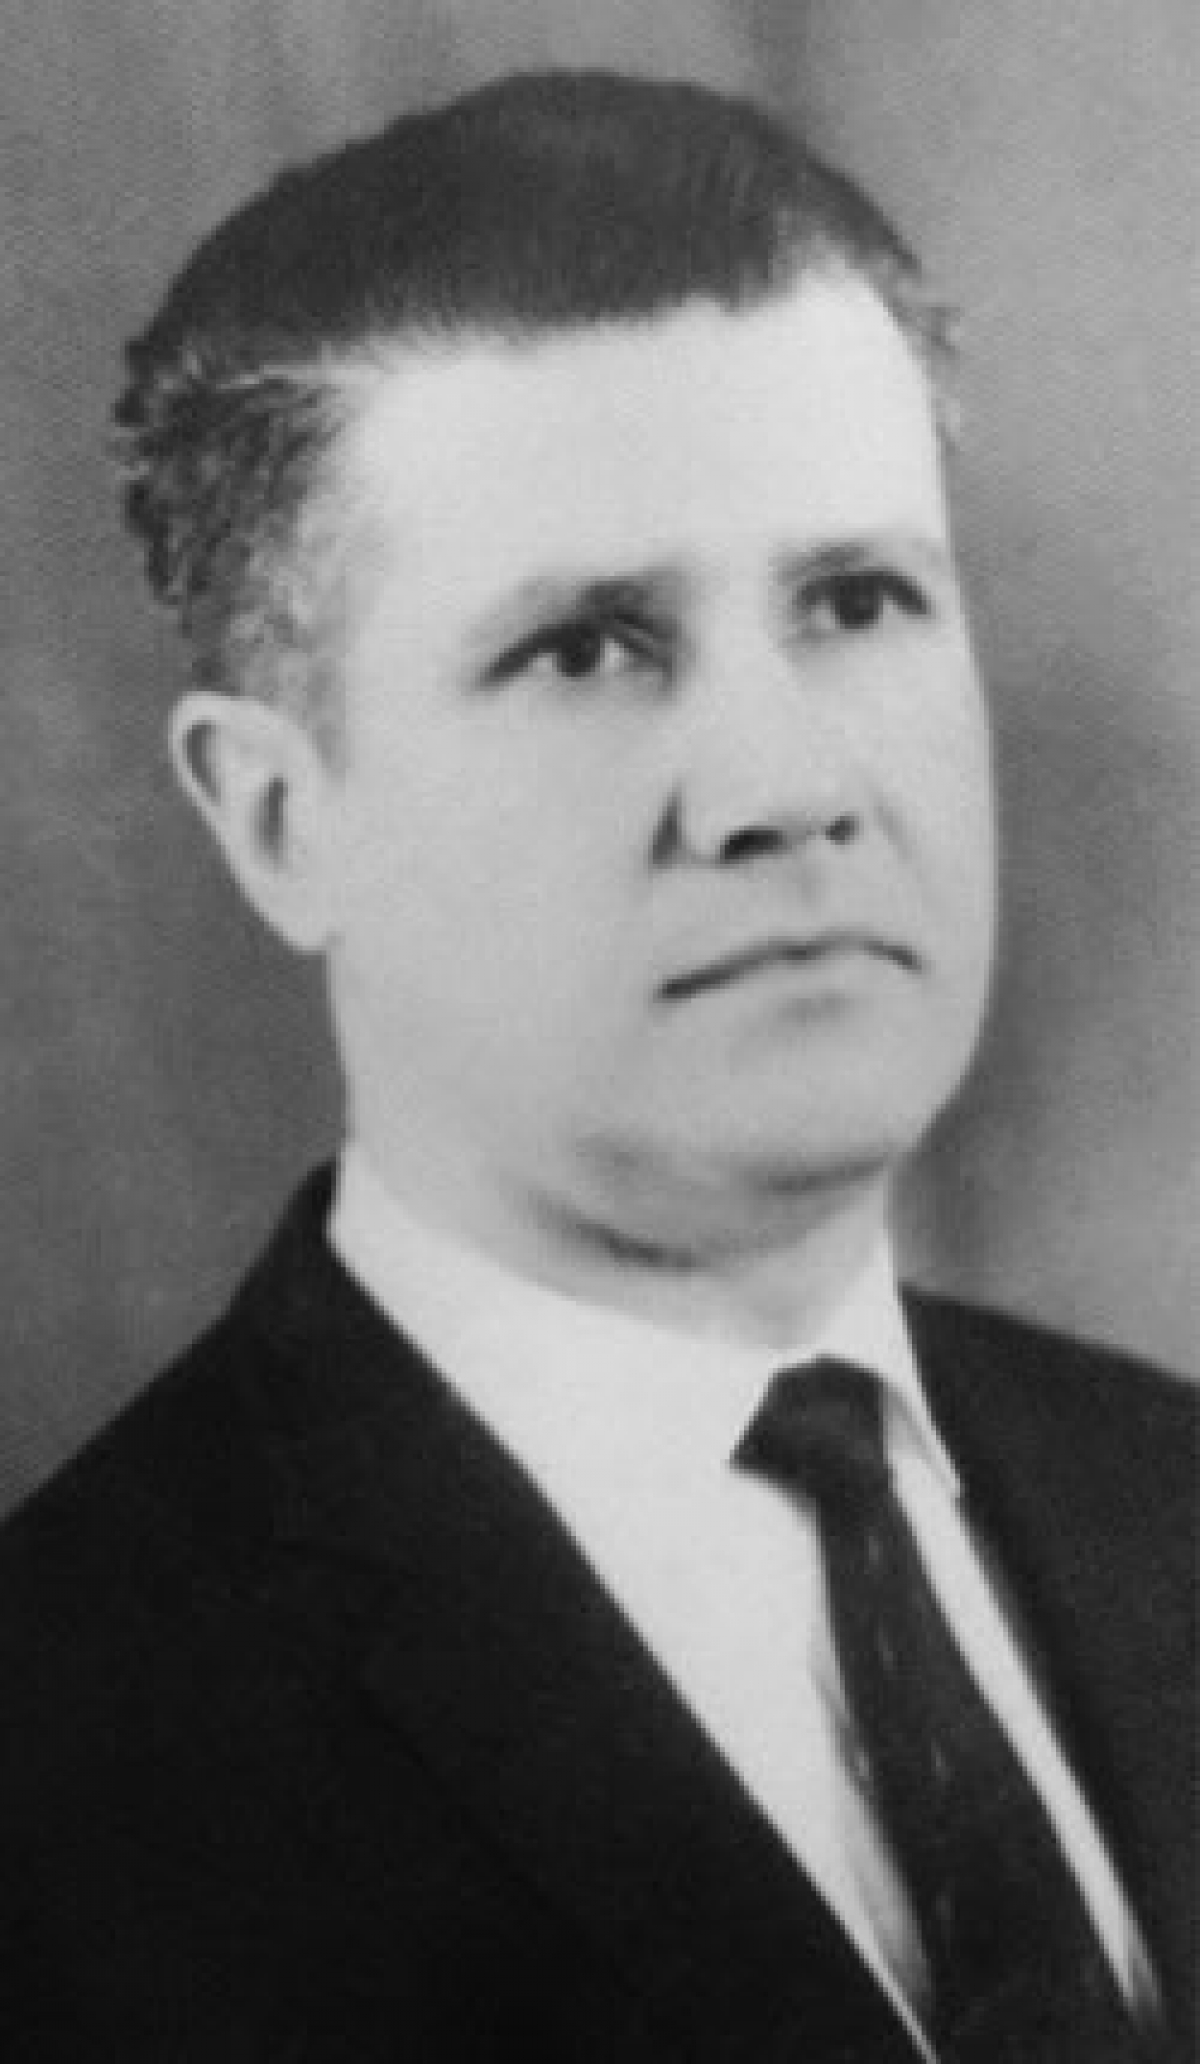 Pedro Merhy Seleme